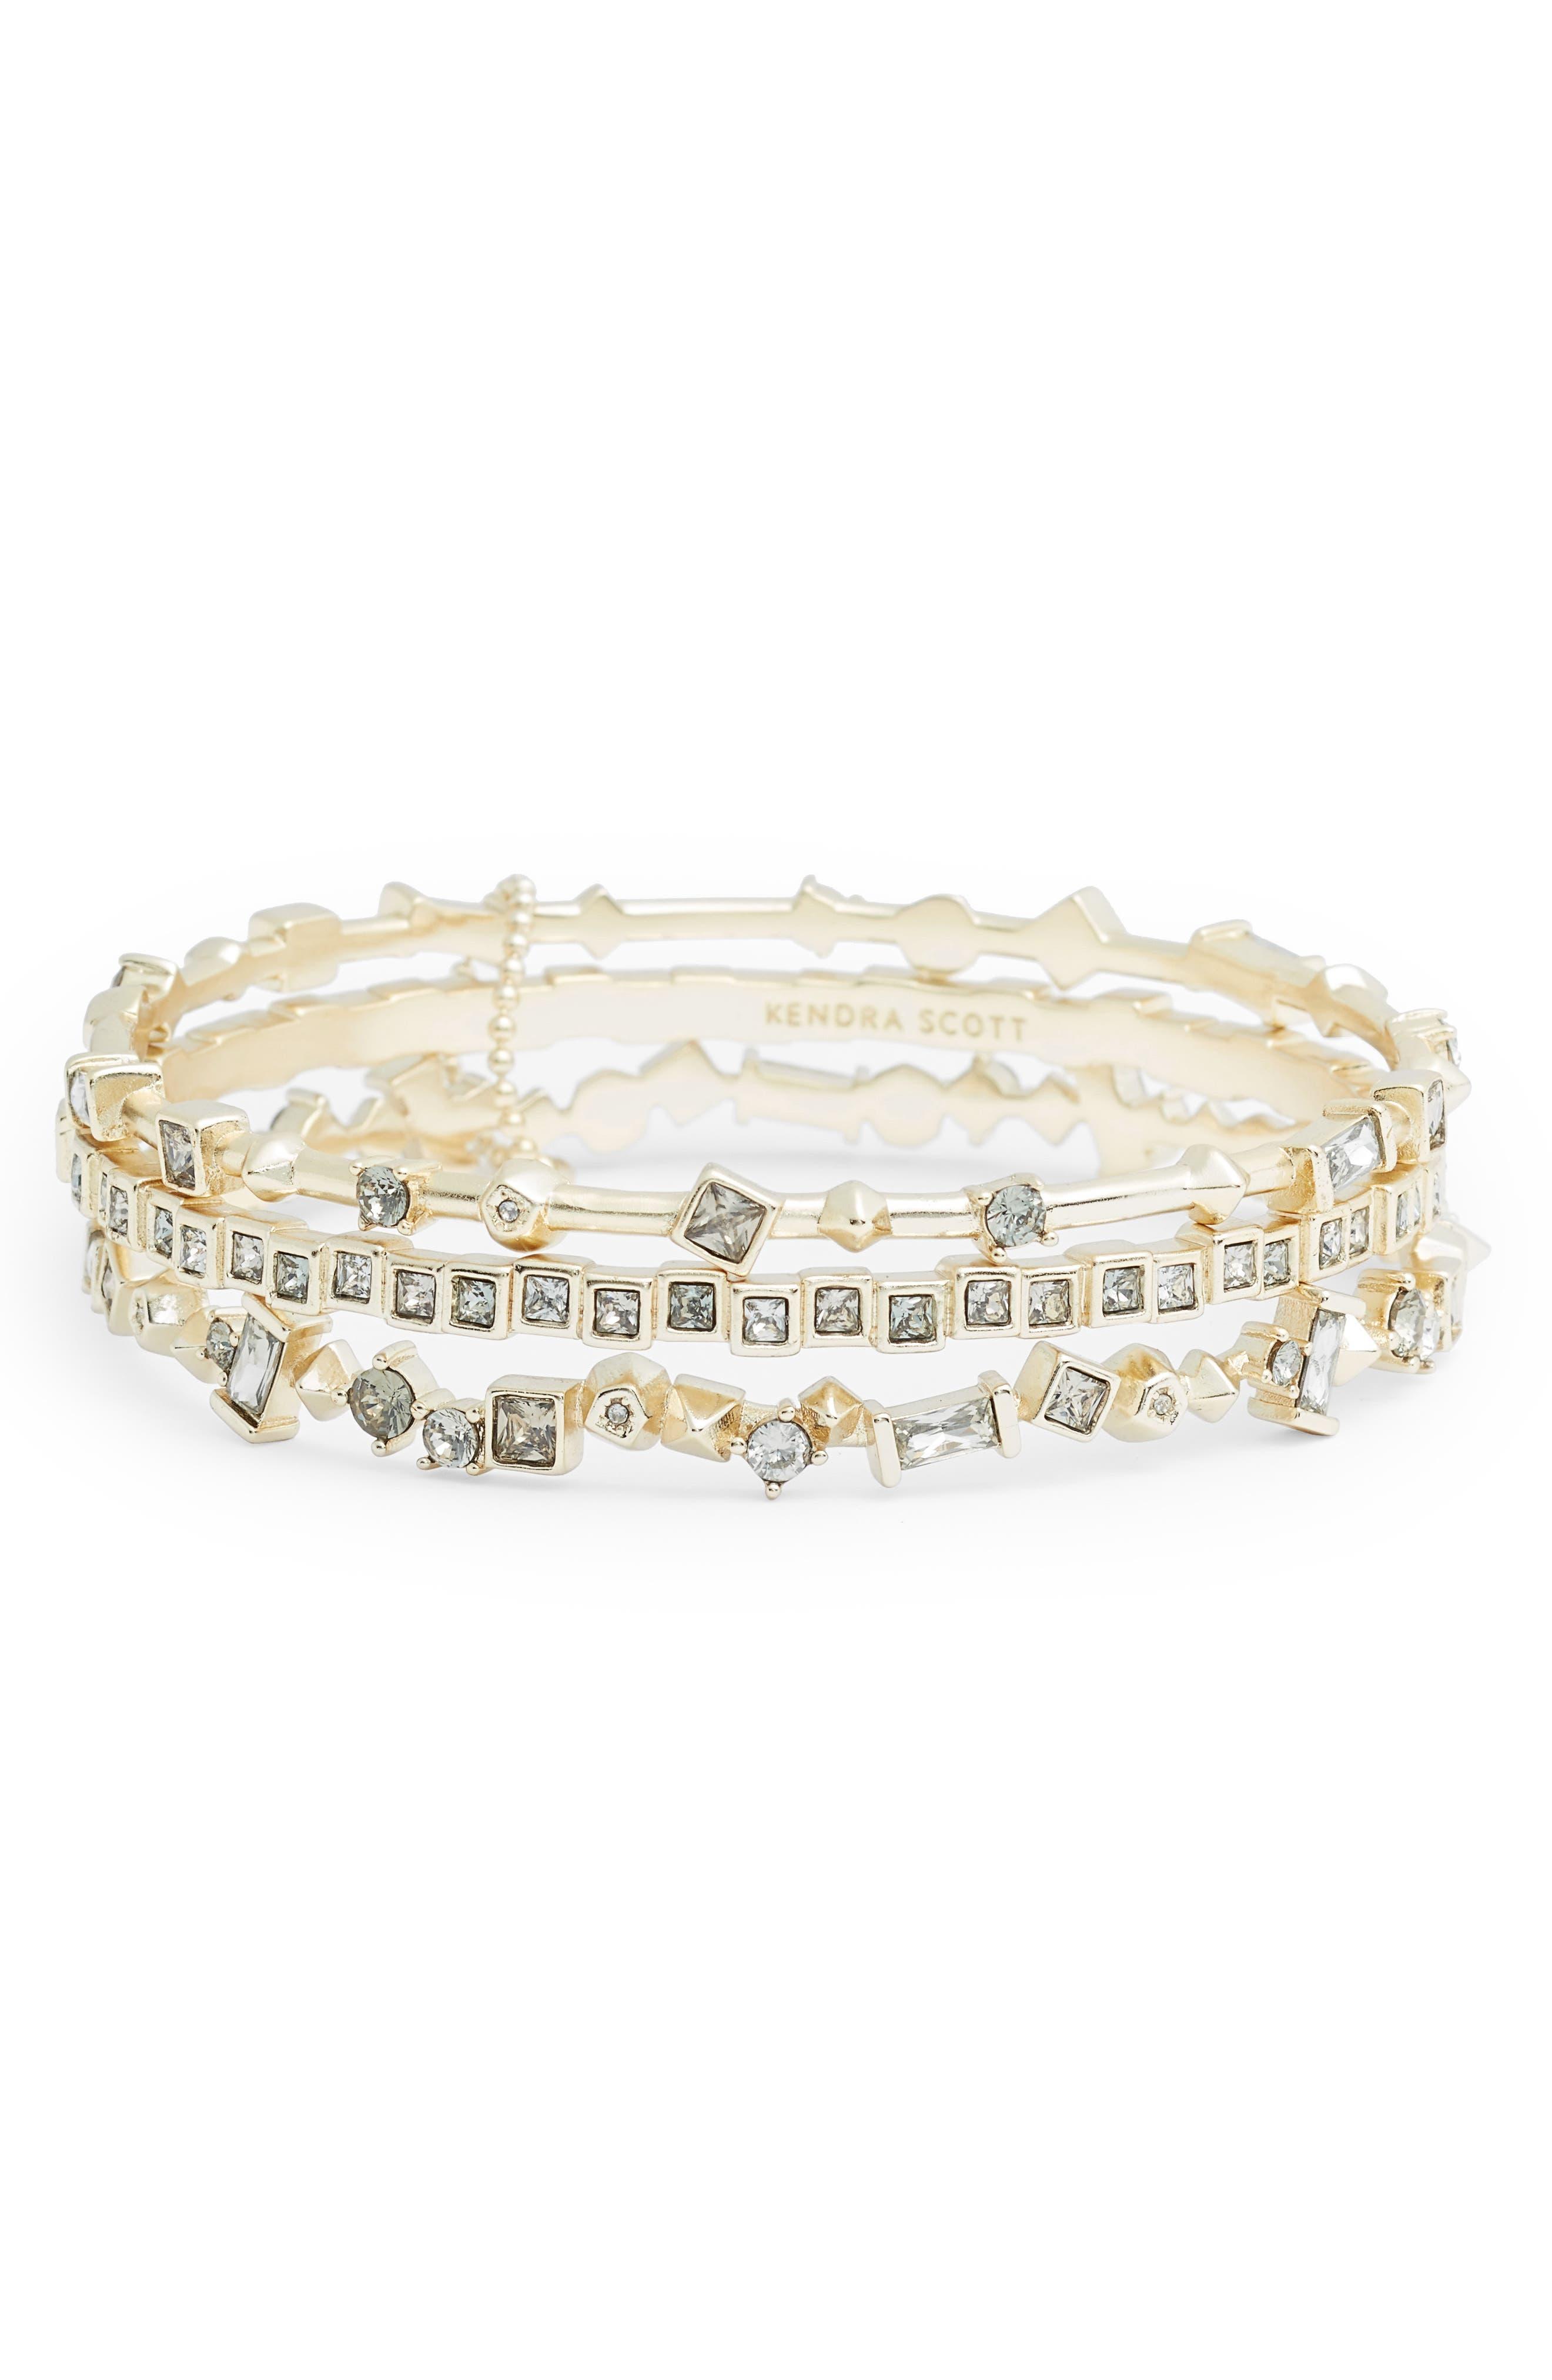 Malia Set of 3 Bracelets,                         Main,                         color, 020